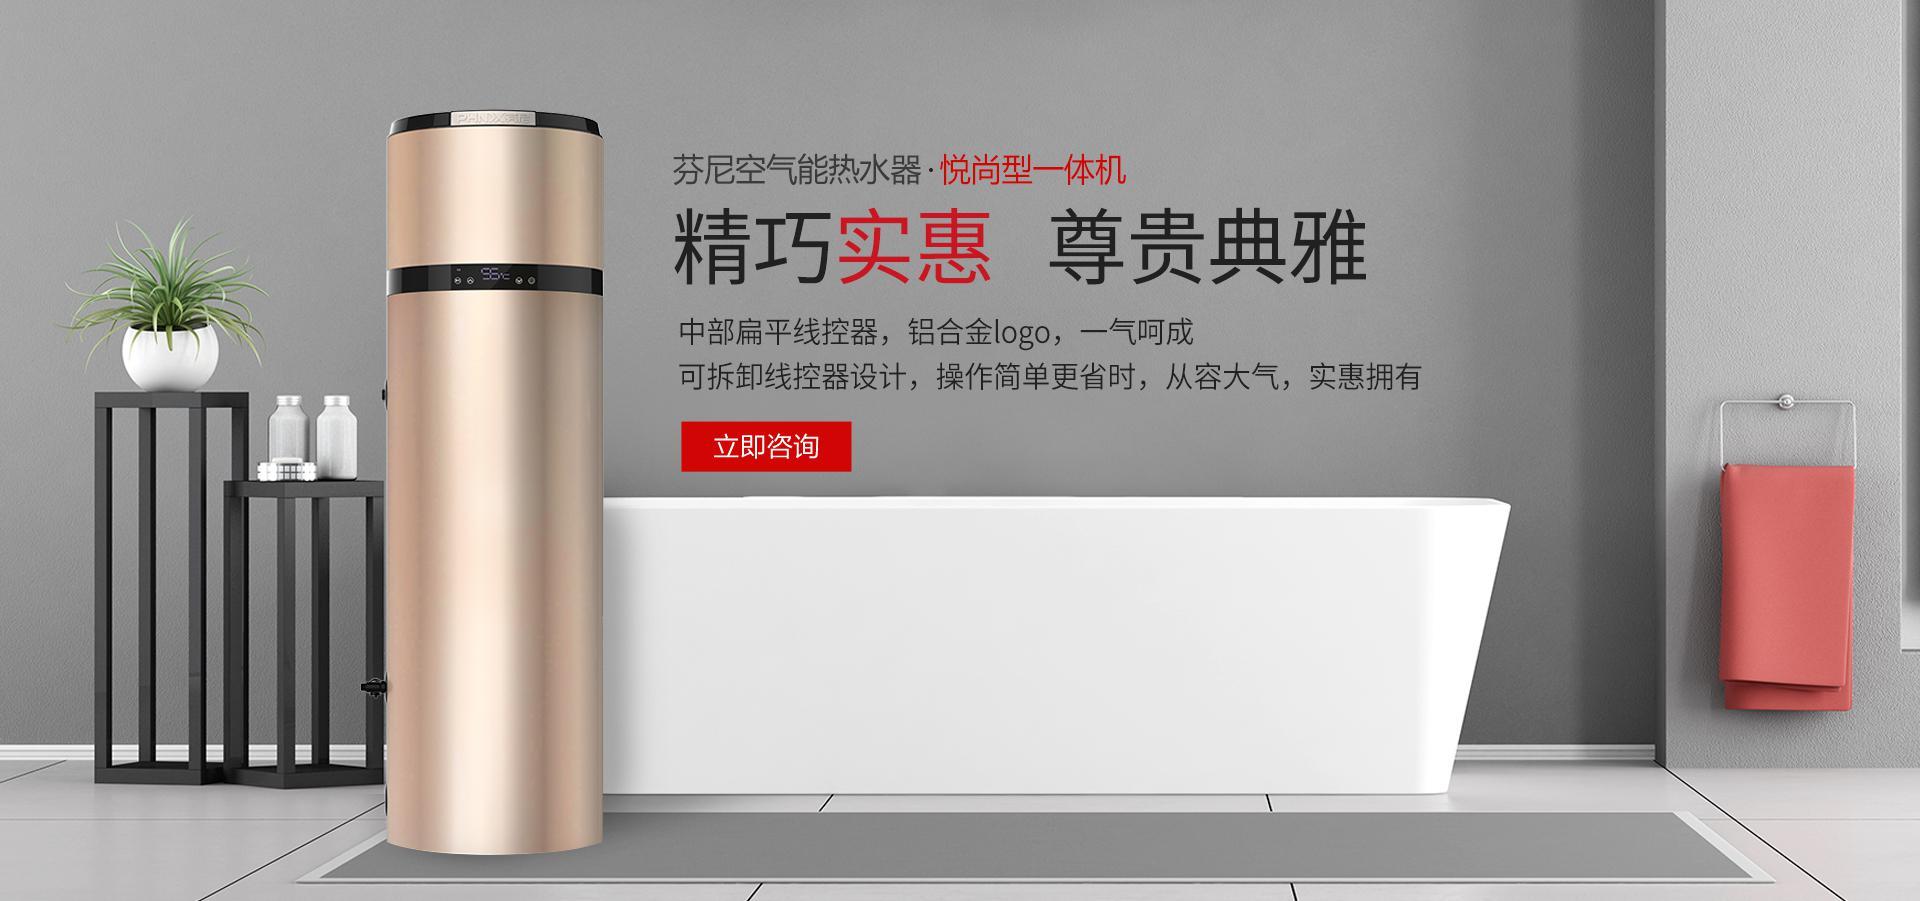 ysb288易胜博官网空气能热水器